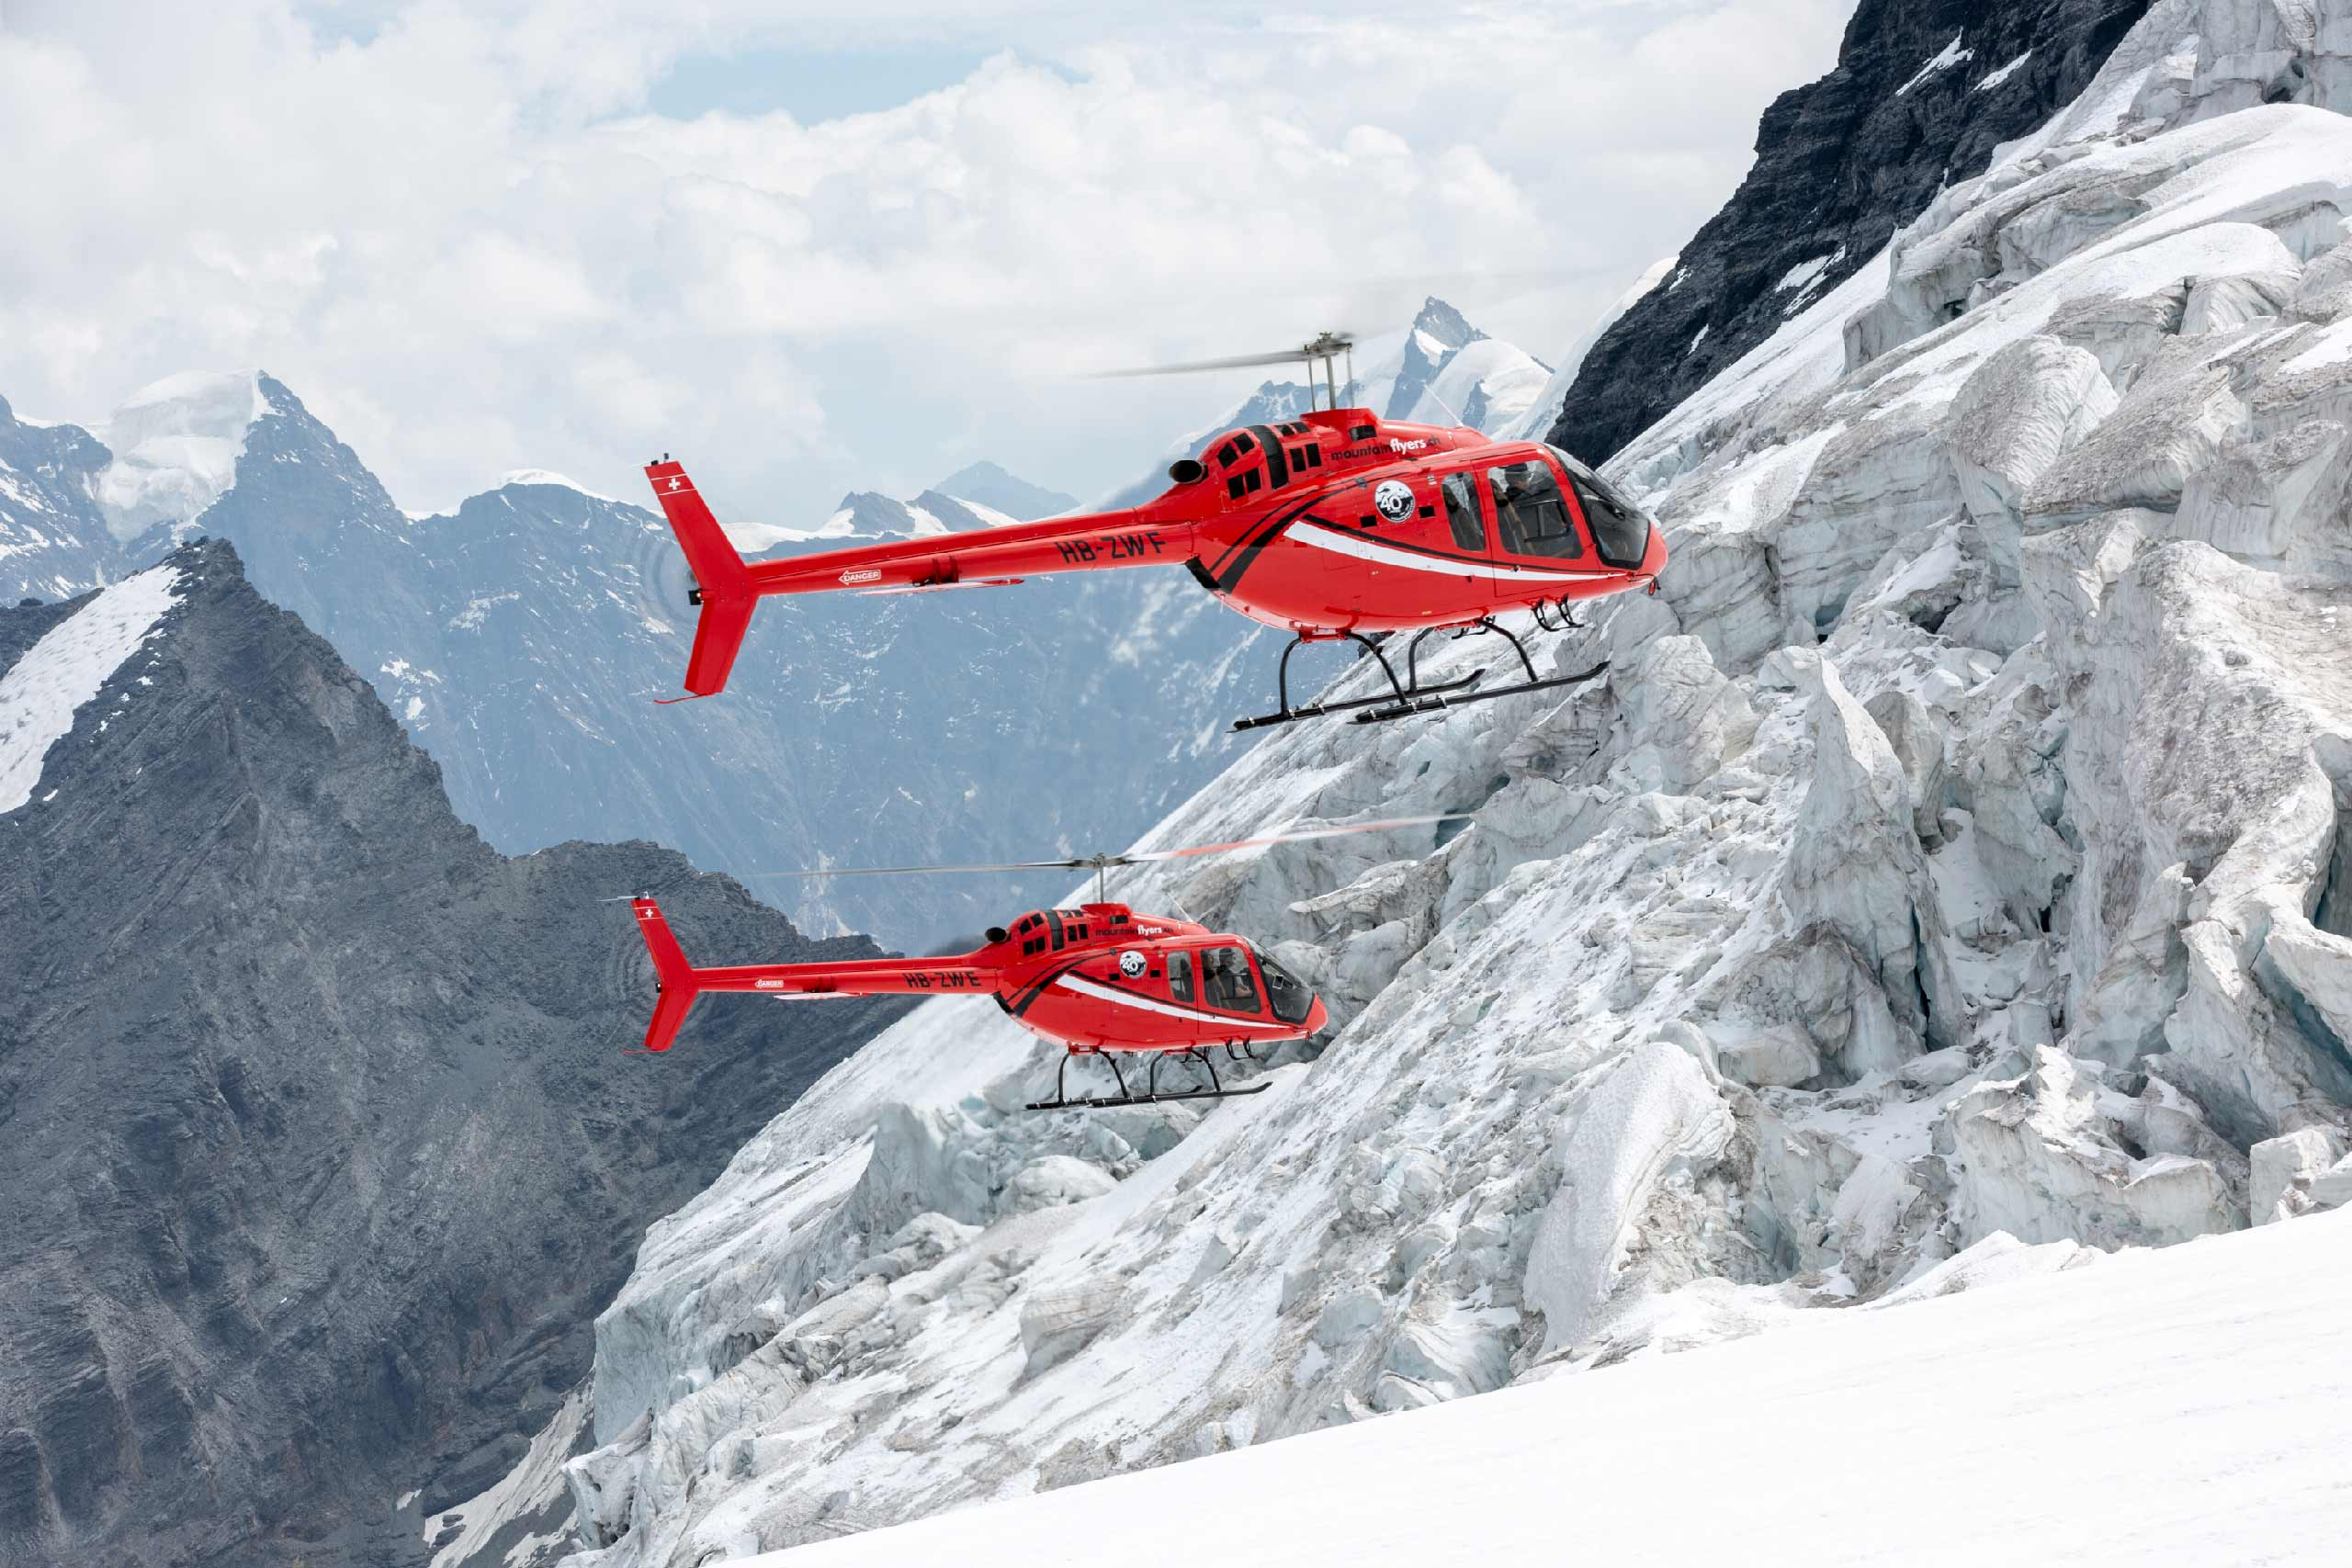 mountainflyer-helikopter-rundfluege-berge-gletscher.jpg